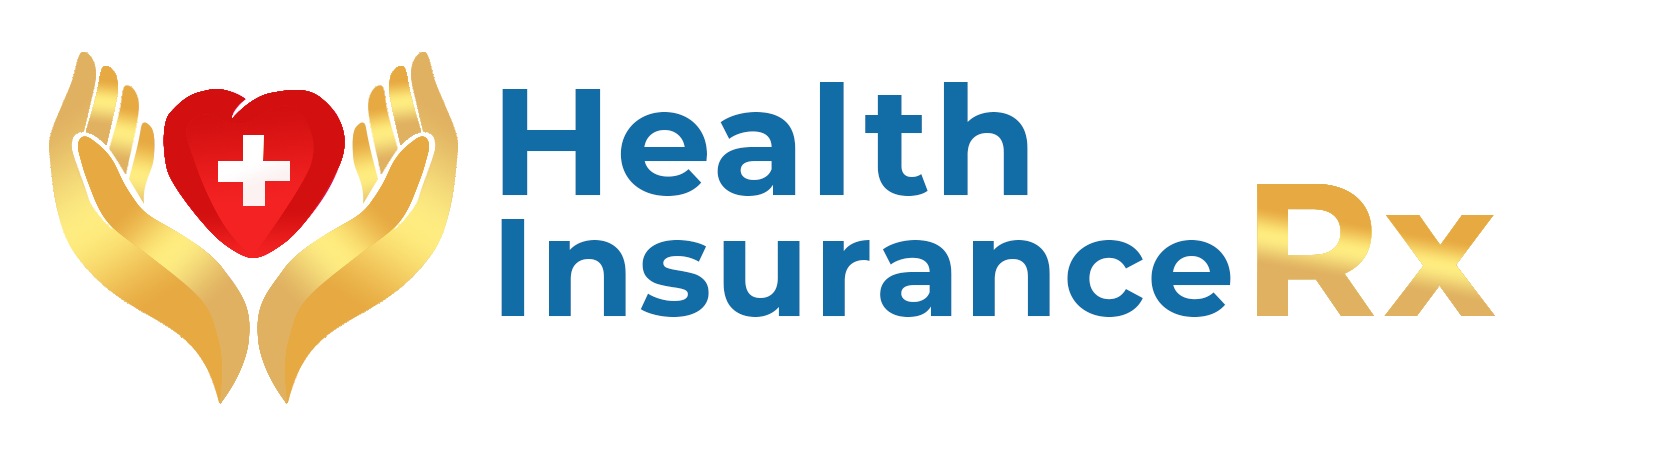 Health Insurance RX